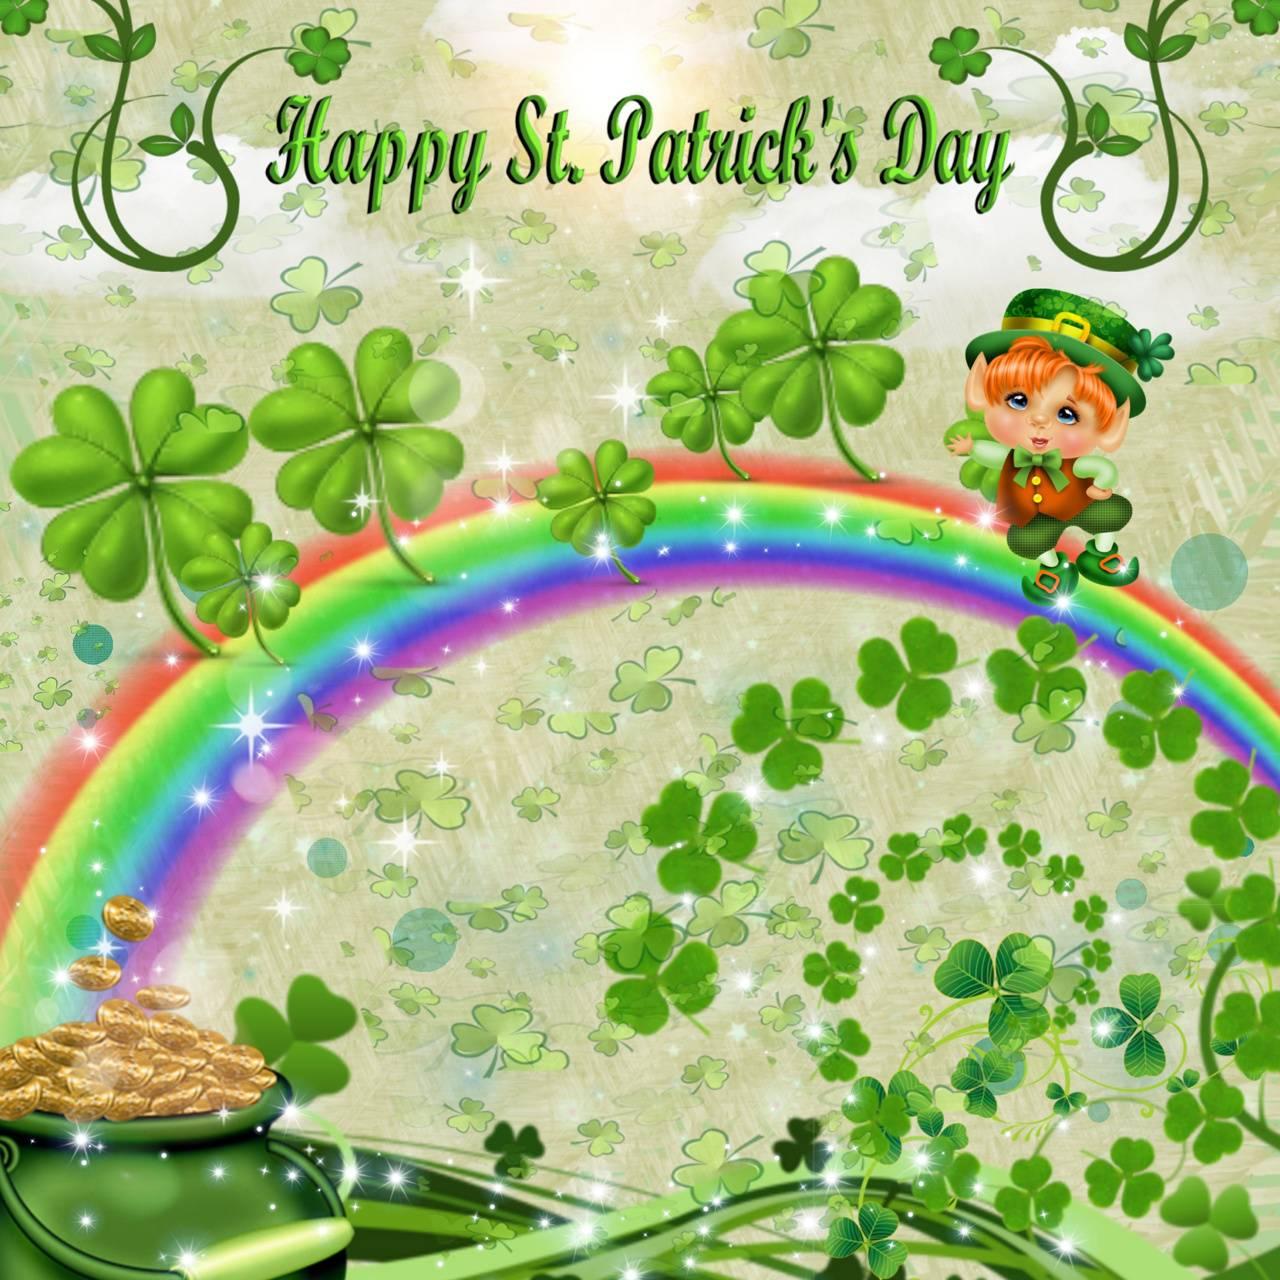 St Patricks Day Wallpaper By Nicolebaker22252355 F4 Free On Zedge